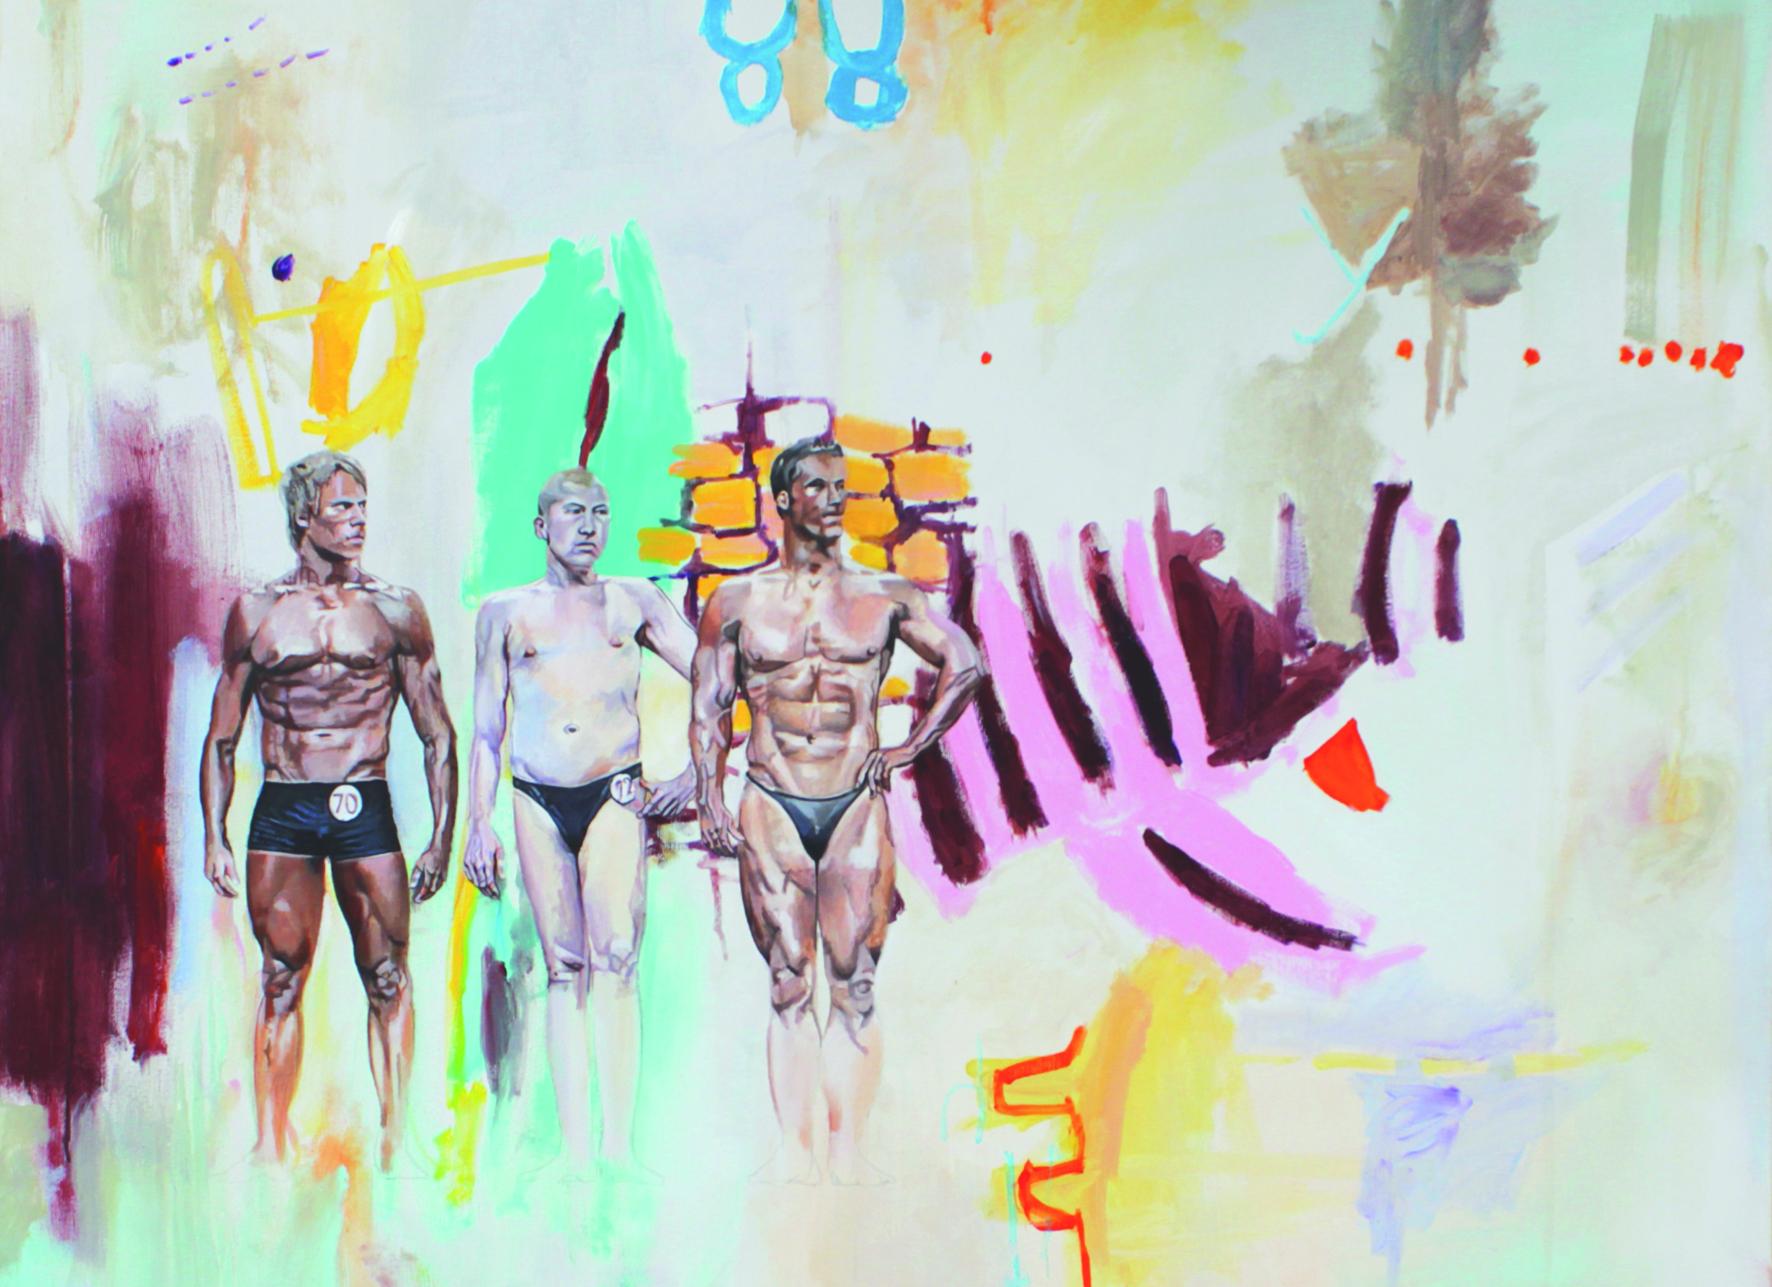 Ausschnitt 'Helden2', Acryl auf Leinwand, 100cm x 100cm, 2017/2018